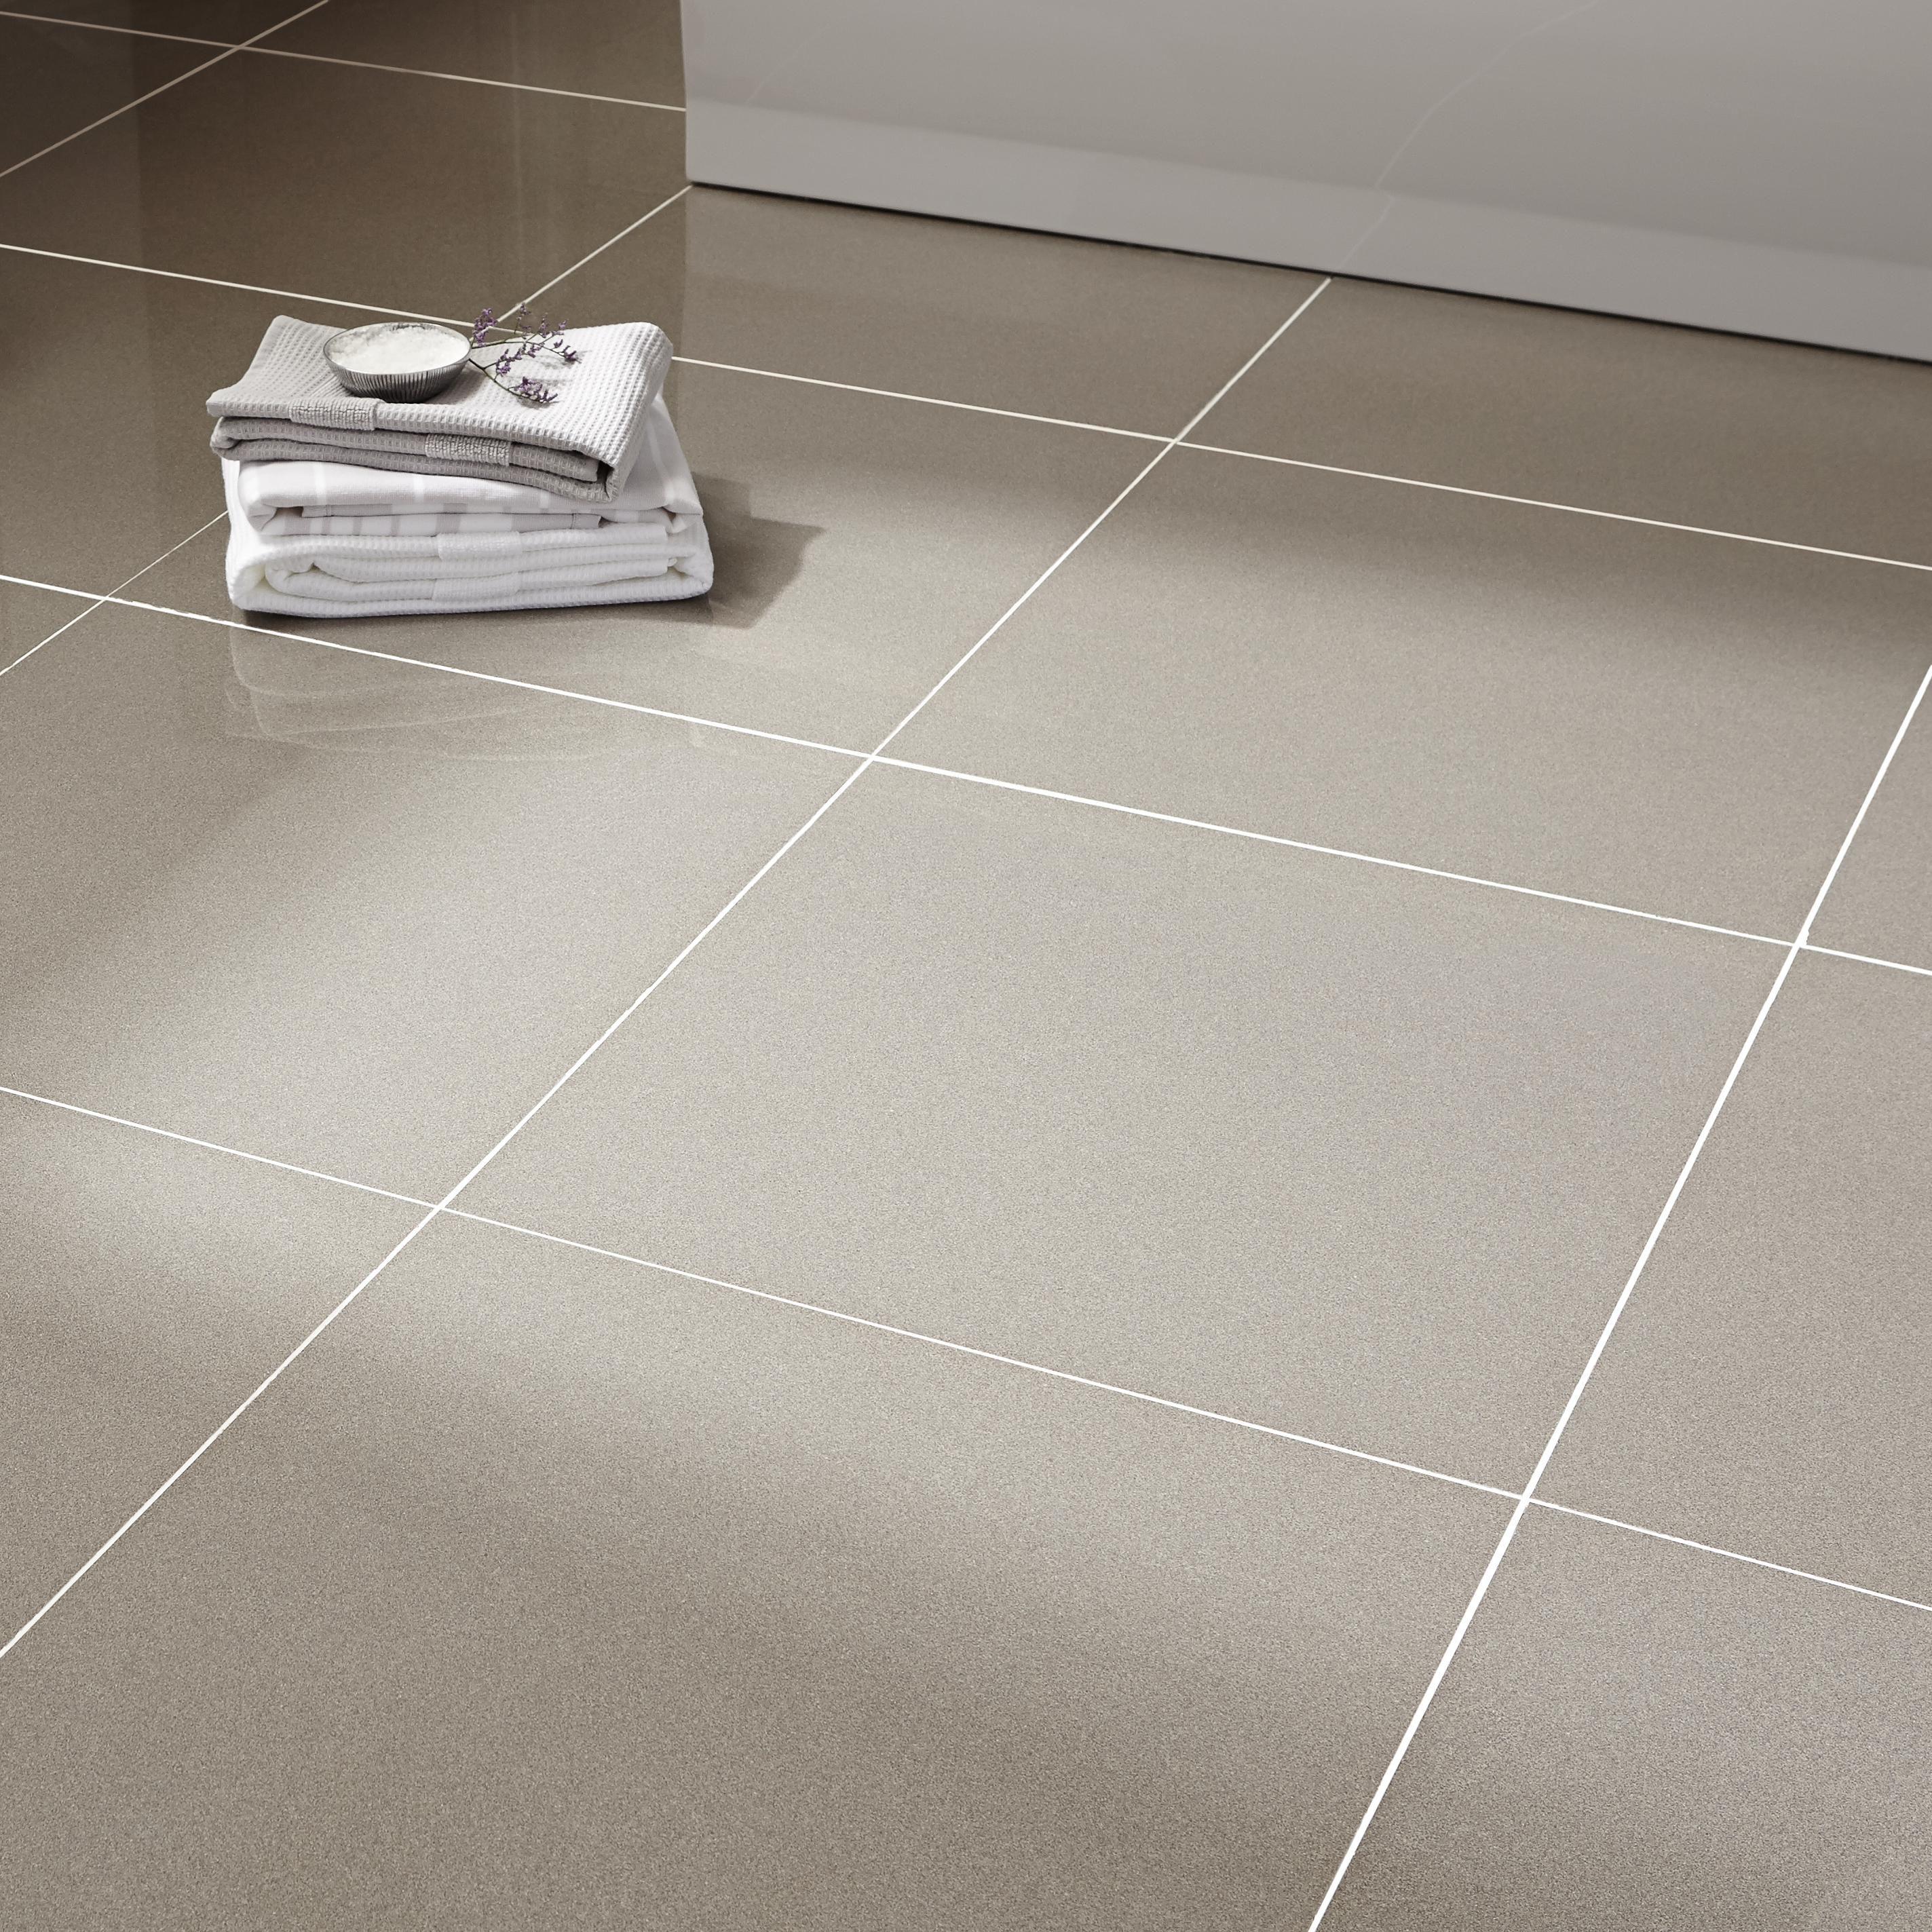 Good How To Lay Floor Tiles